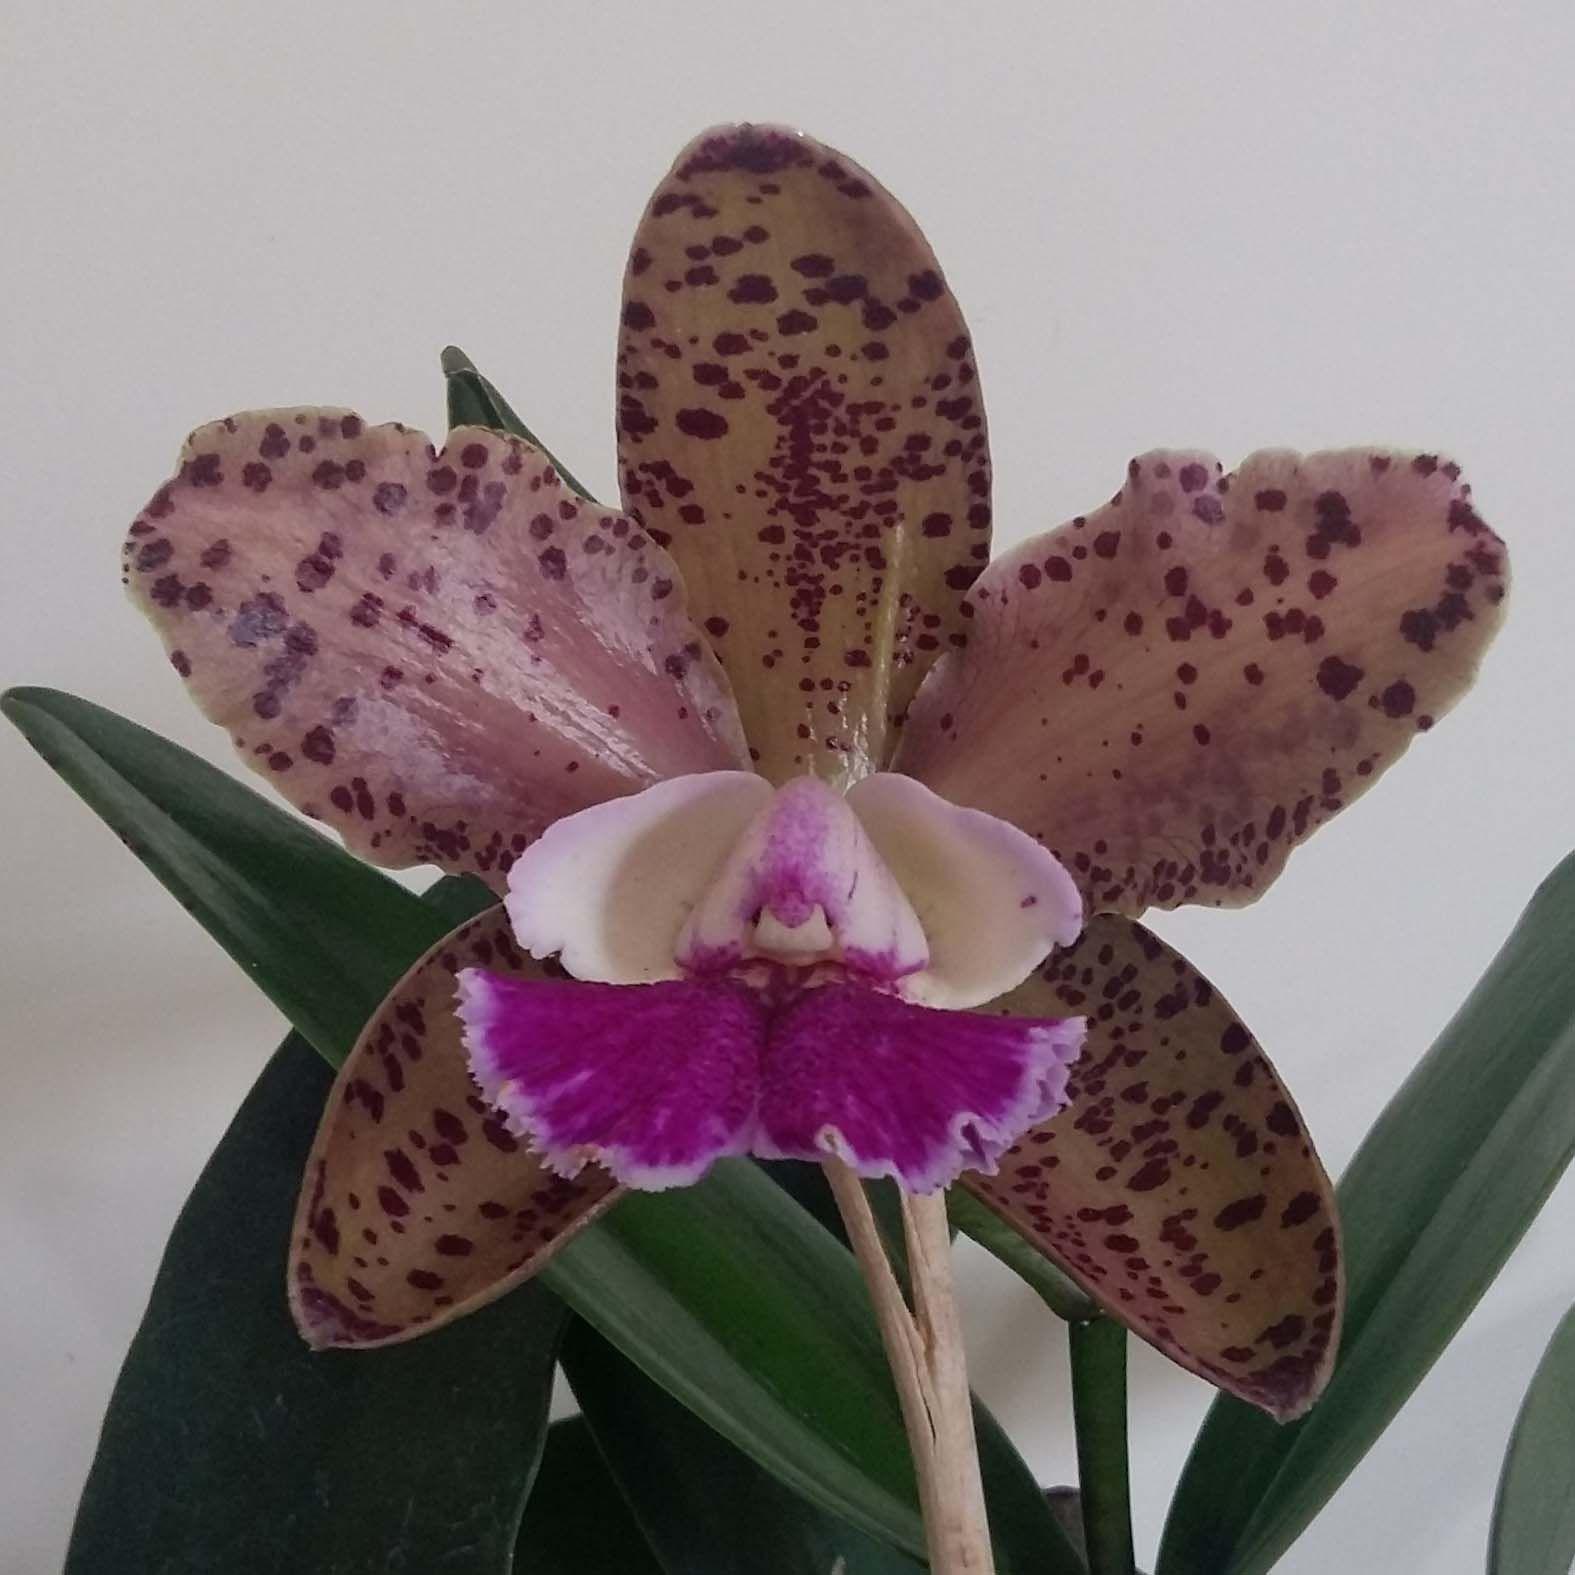 C. Brabantiae x C. kerchoveana x C. Nobile´s Wax Toy  X C. Schilleriana x C. Cruzeiro do Sul